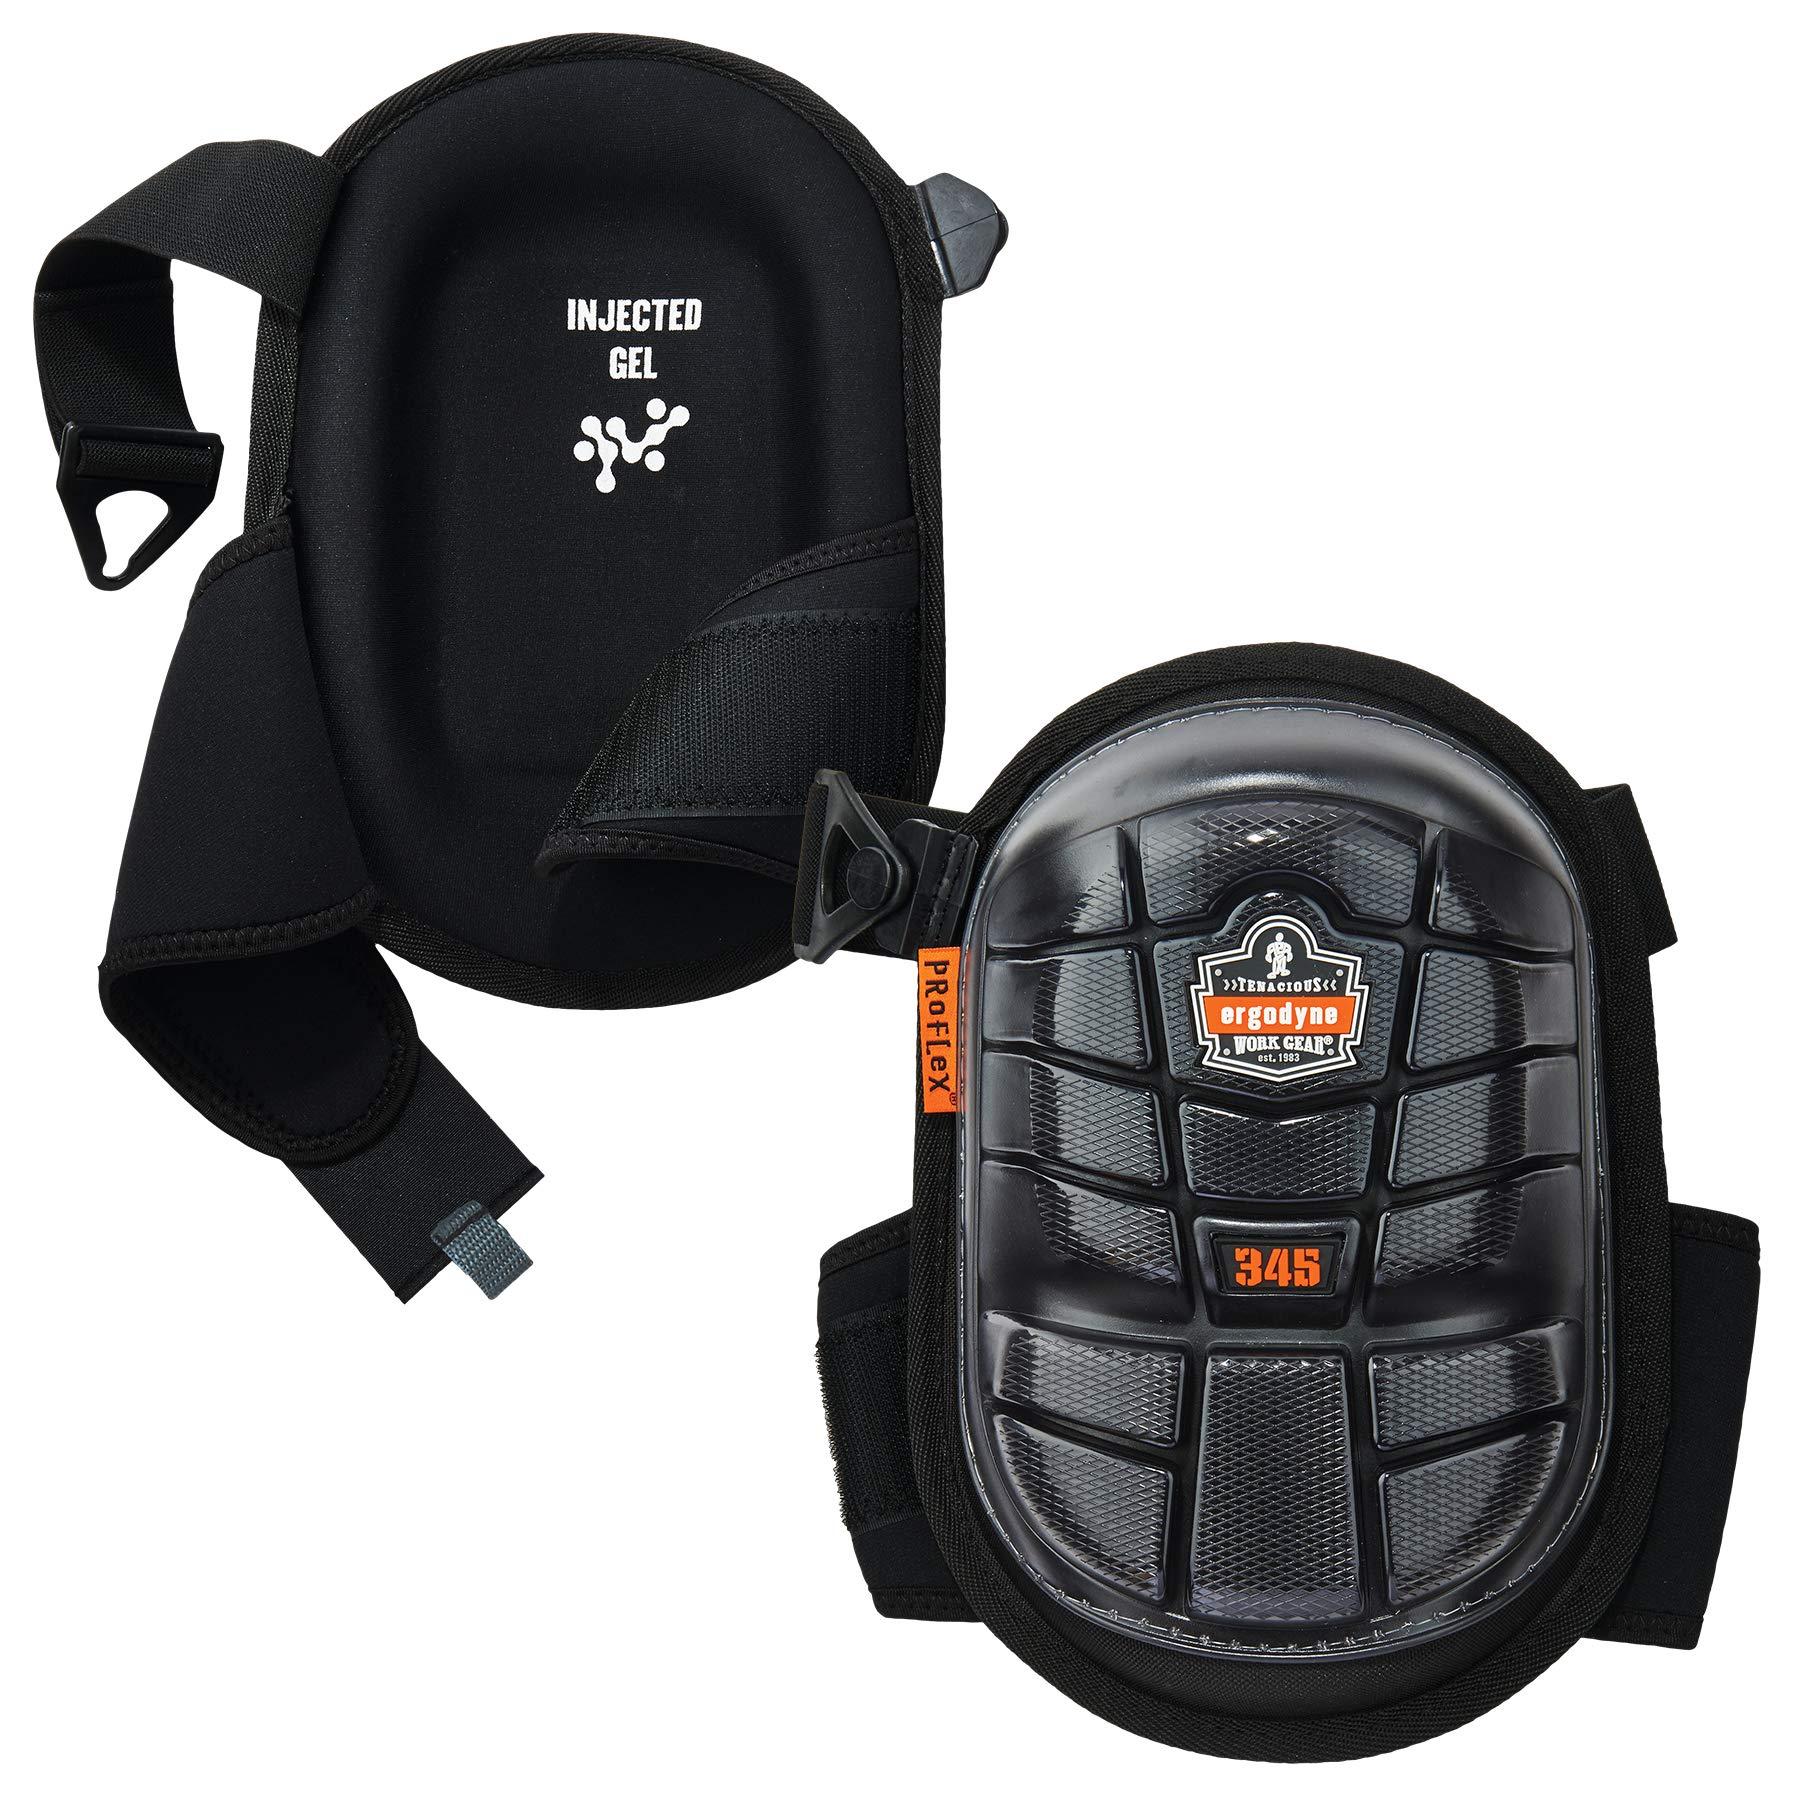 Ergodyne ProFlex 345 Professional Knee Pads, Protective Long Cap, Injected Gel Padded Technology, Adjustable Straps, Black